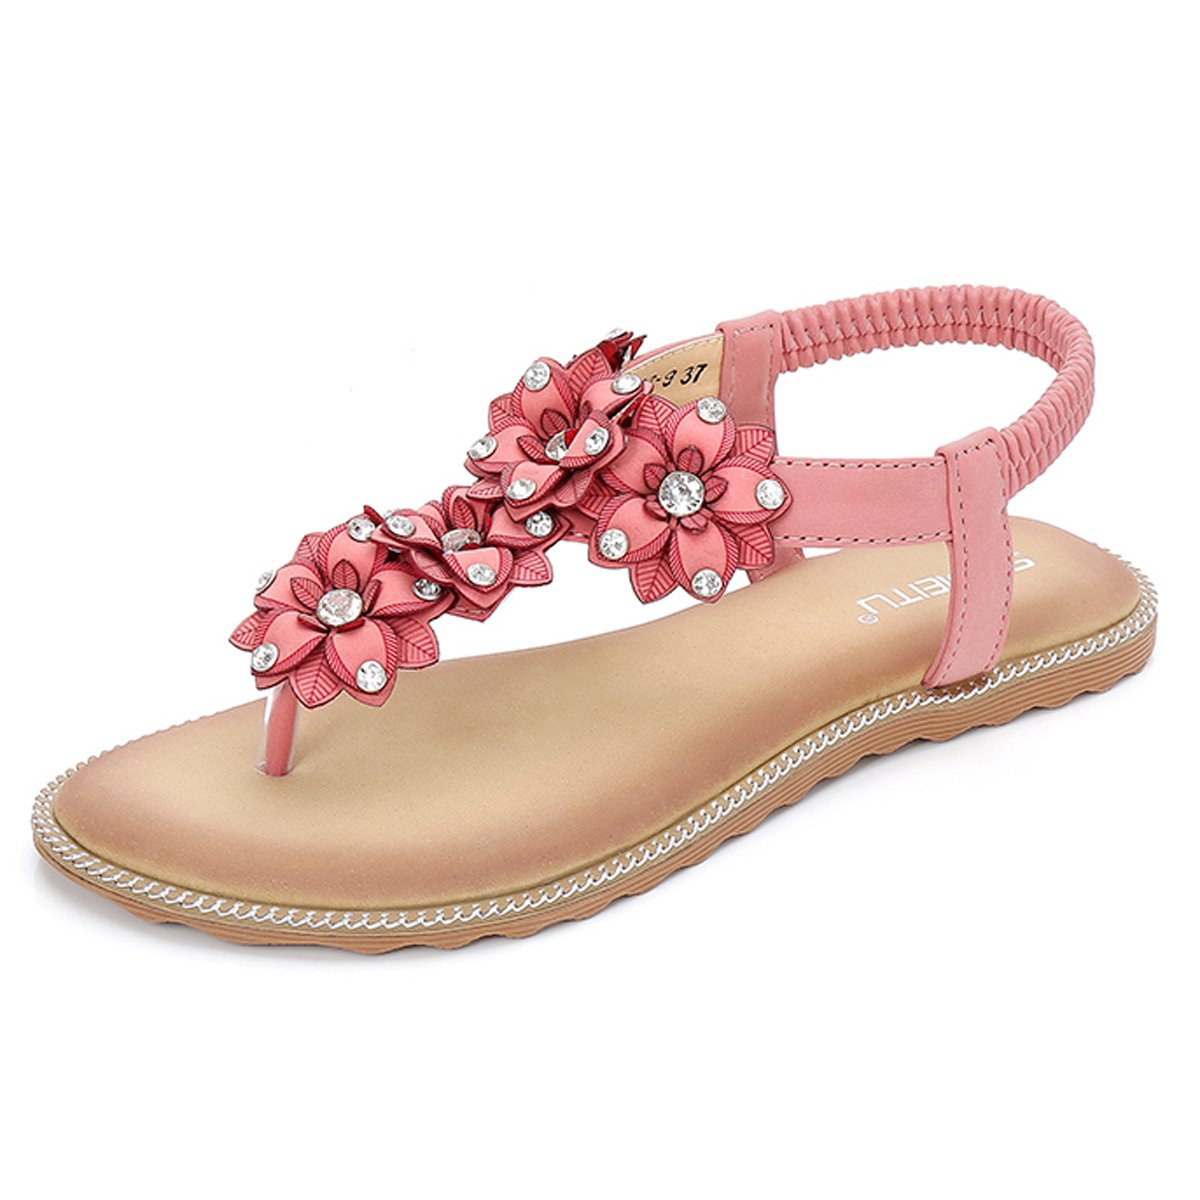 gracosy Damen Sandalen, Flip Flops Sommer Sandals Flach Zehentrenner T-Strap Offen Bouml;hmische Strand Schuhe  39 EU|Pink